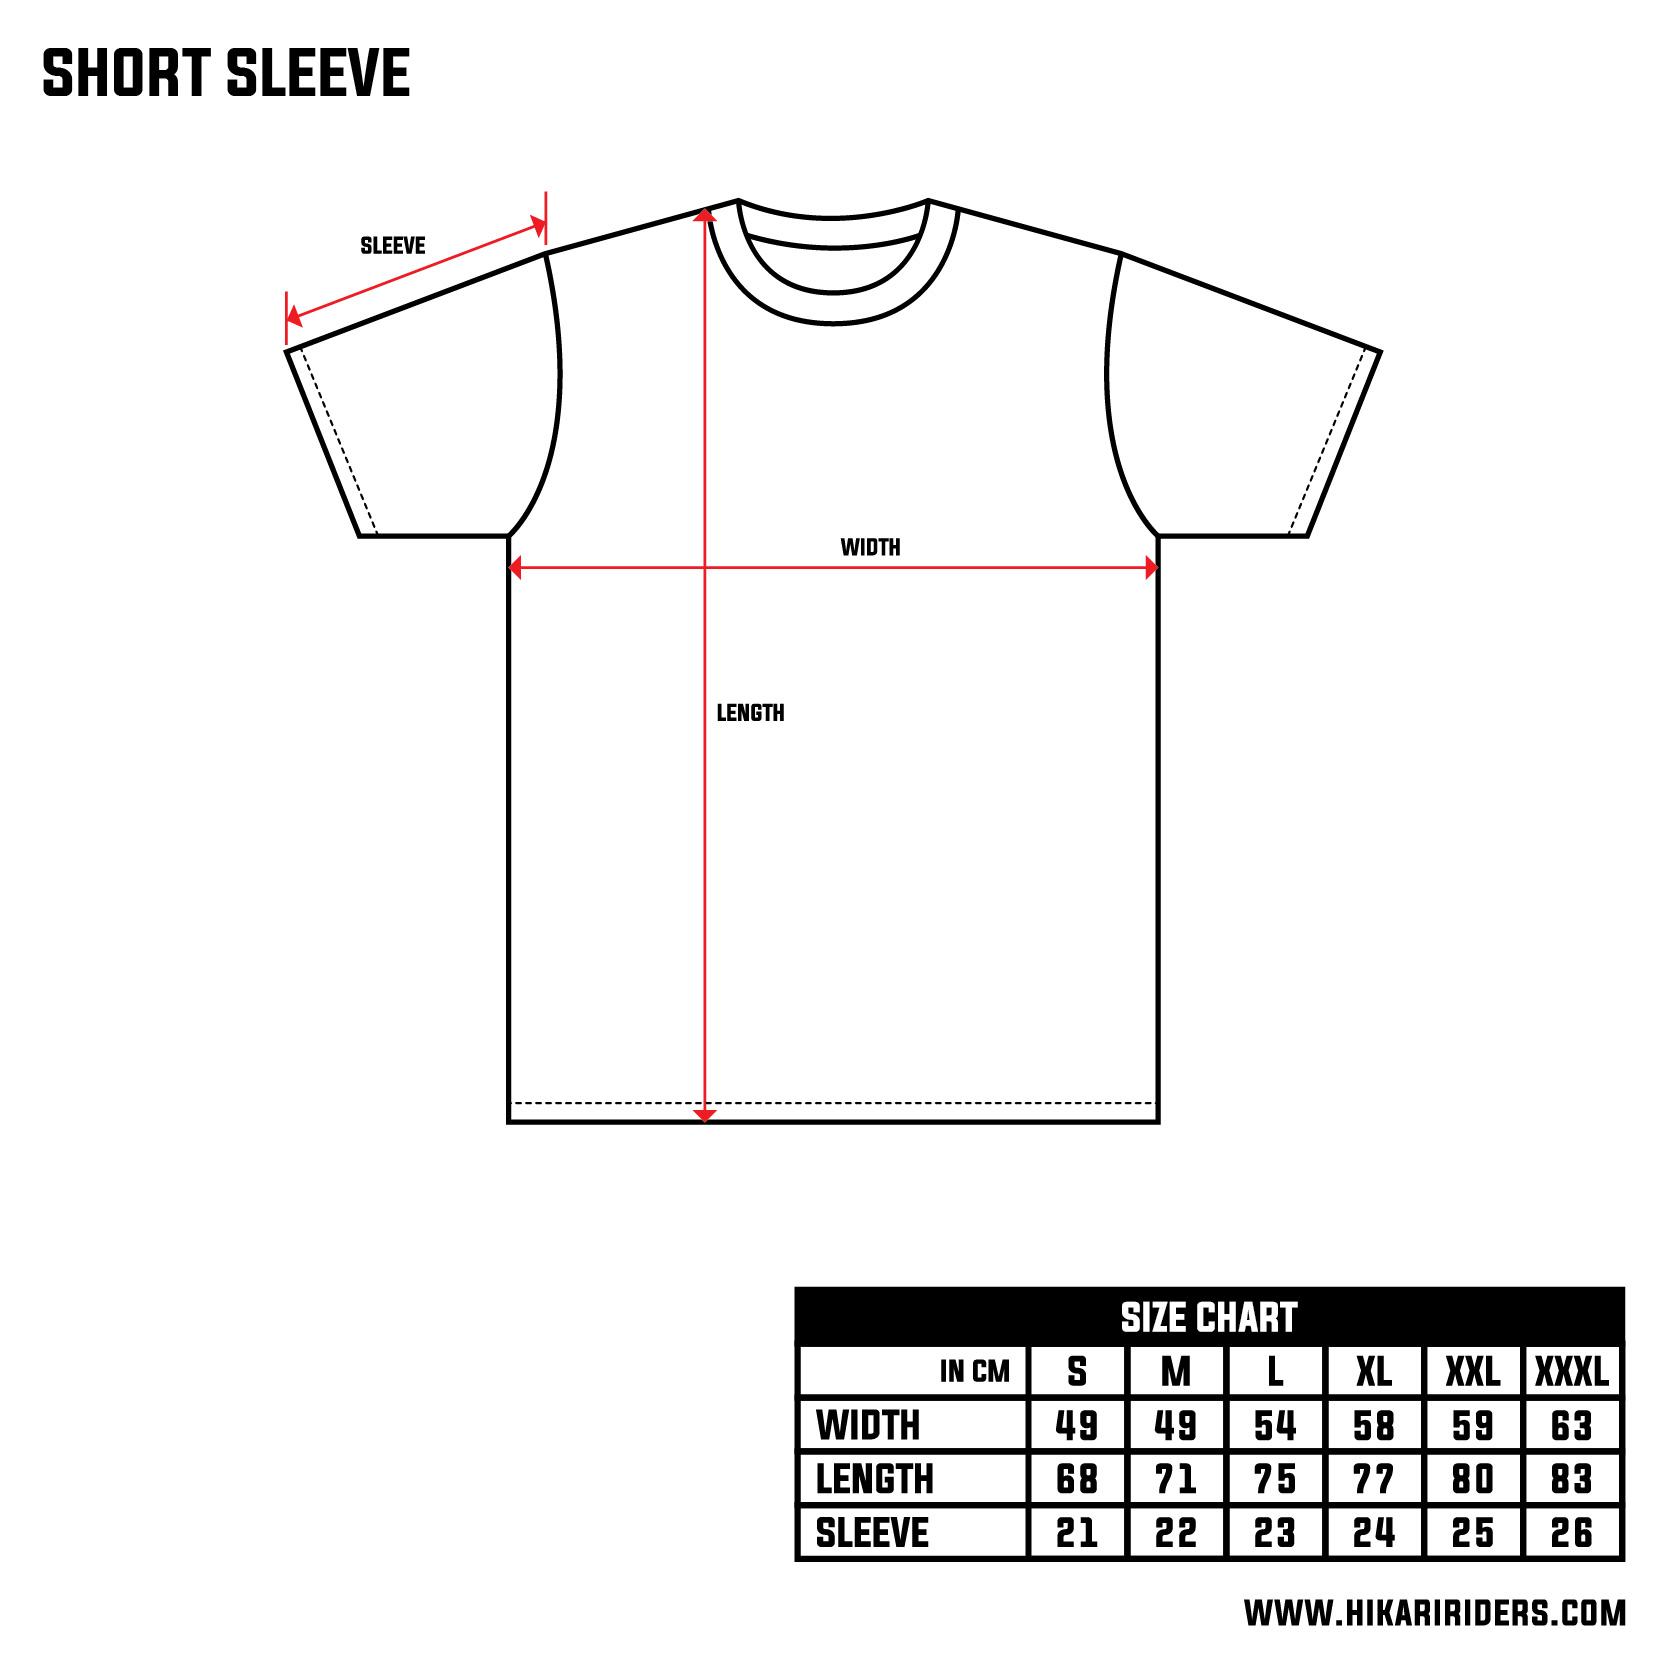 Short Sleeve Tshirt.jpg